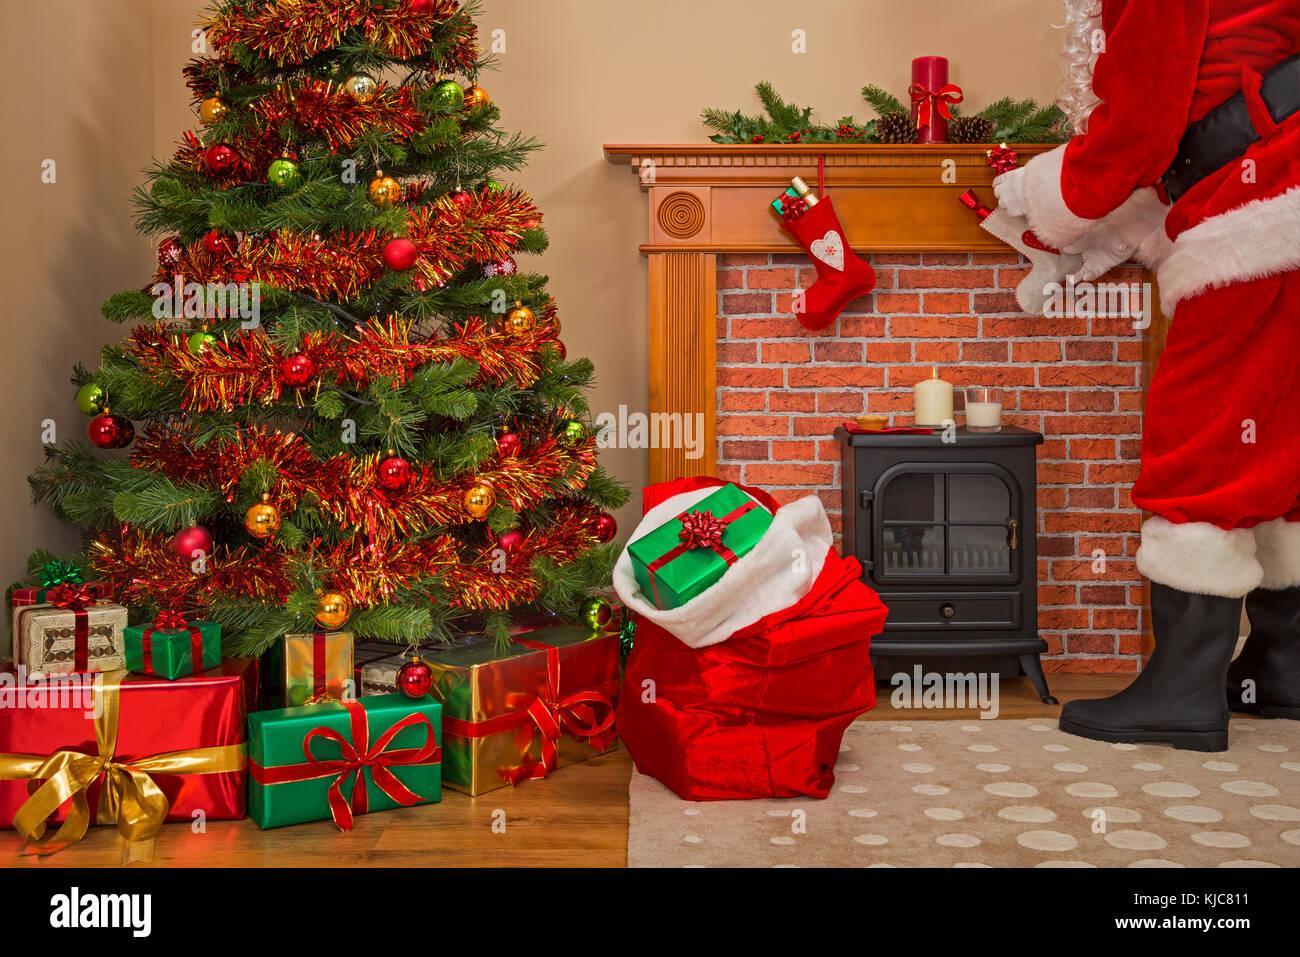 Christmas presents under the tree - Stock Photo - Dissolve |Wrapped Christmas Presents Under The Tree